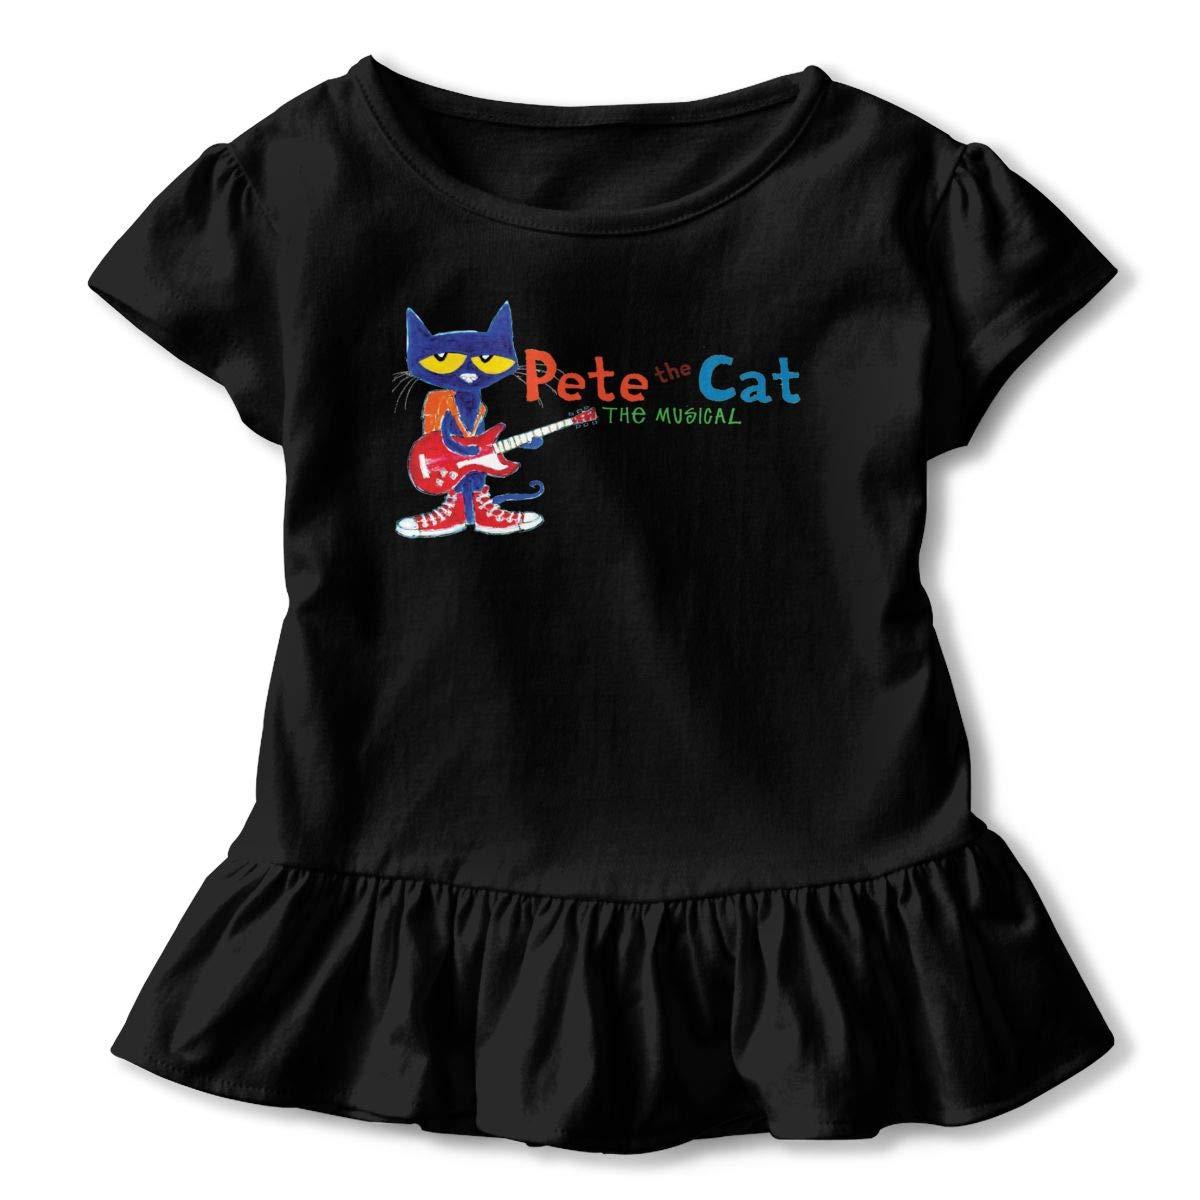 Pete The Cat Shirt Comfort Infant Girl Flounced T Shirts Tee Shirts for 2-6T Kids Girls